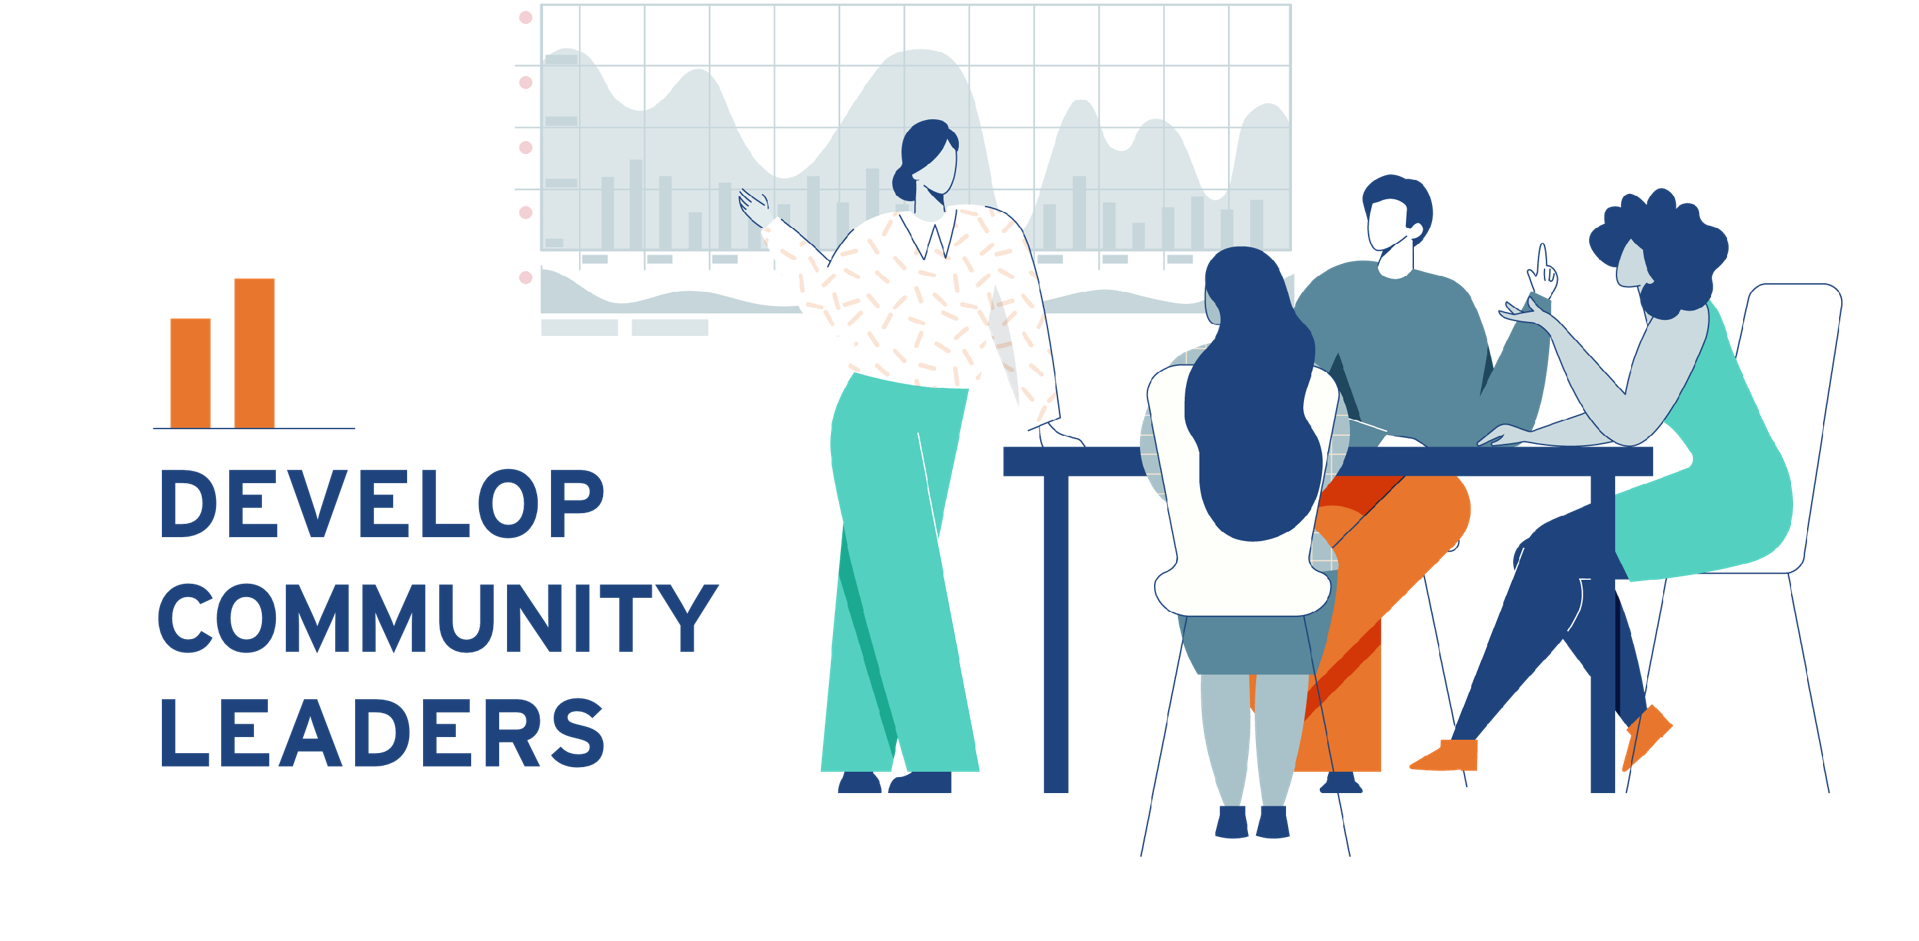 2 develop community leaders